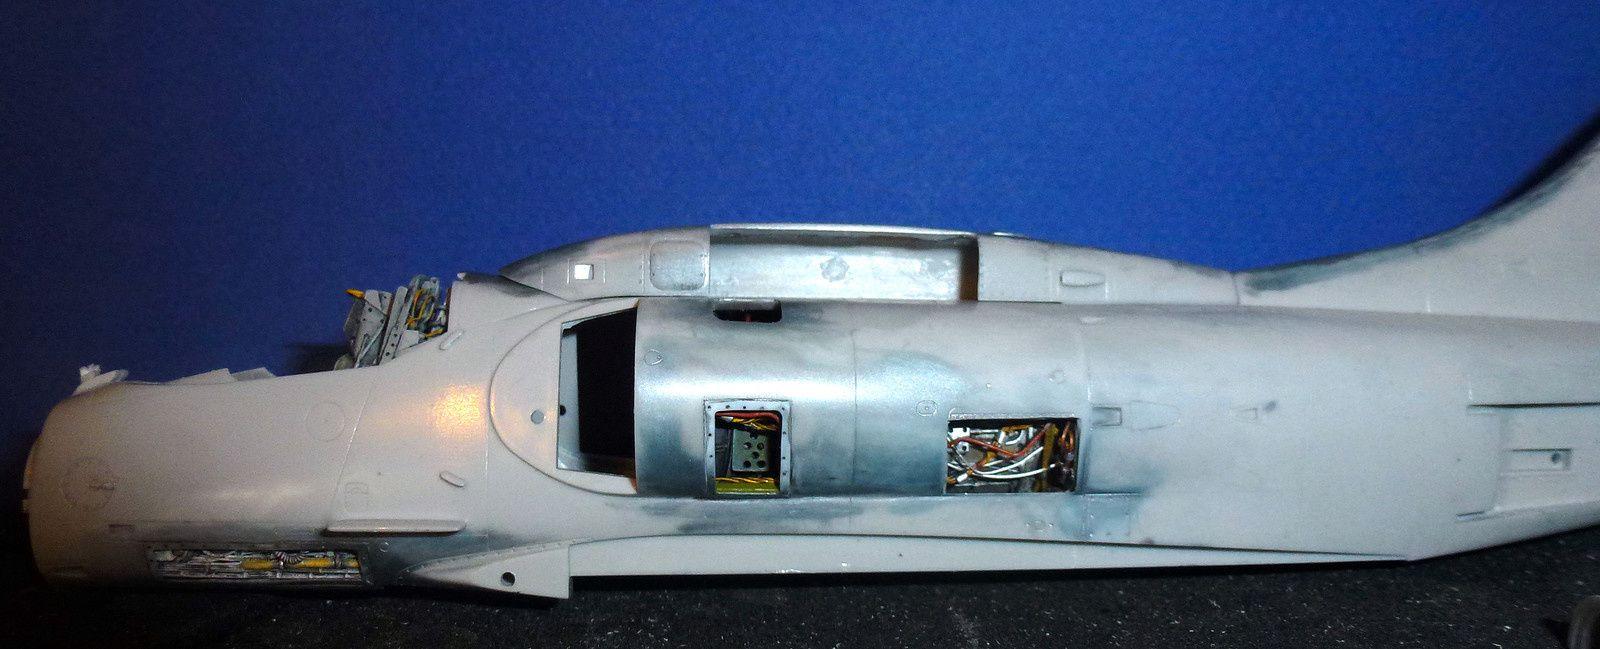 A-4 KU Skyhawk - Free Kuweit Guerre du Golfe 1990/91 - Montage maquette HASEGAWA 1/48 - EN COURS....